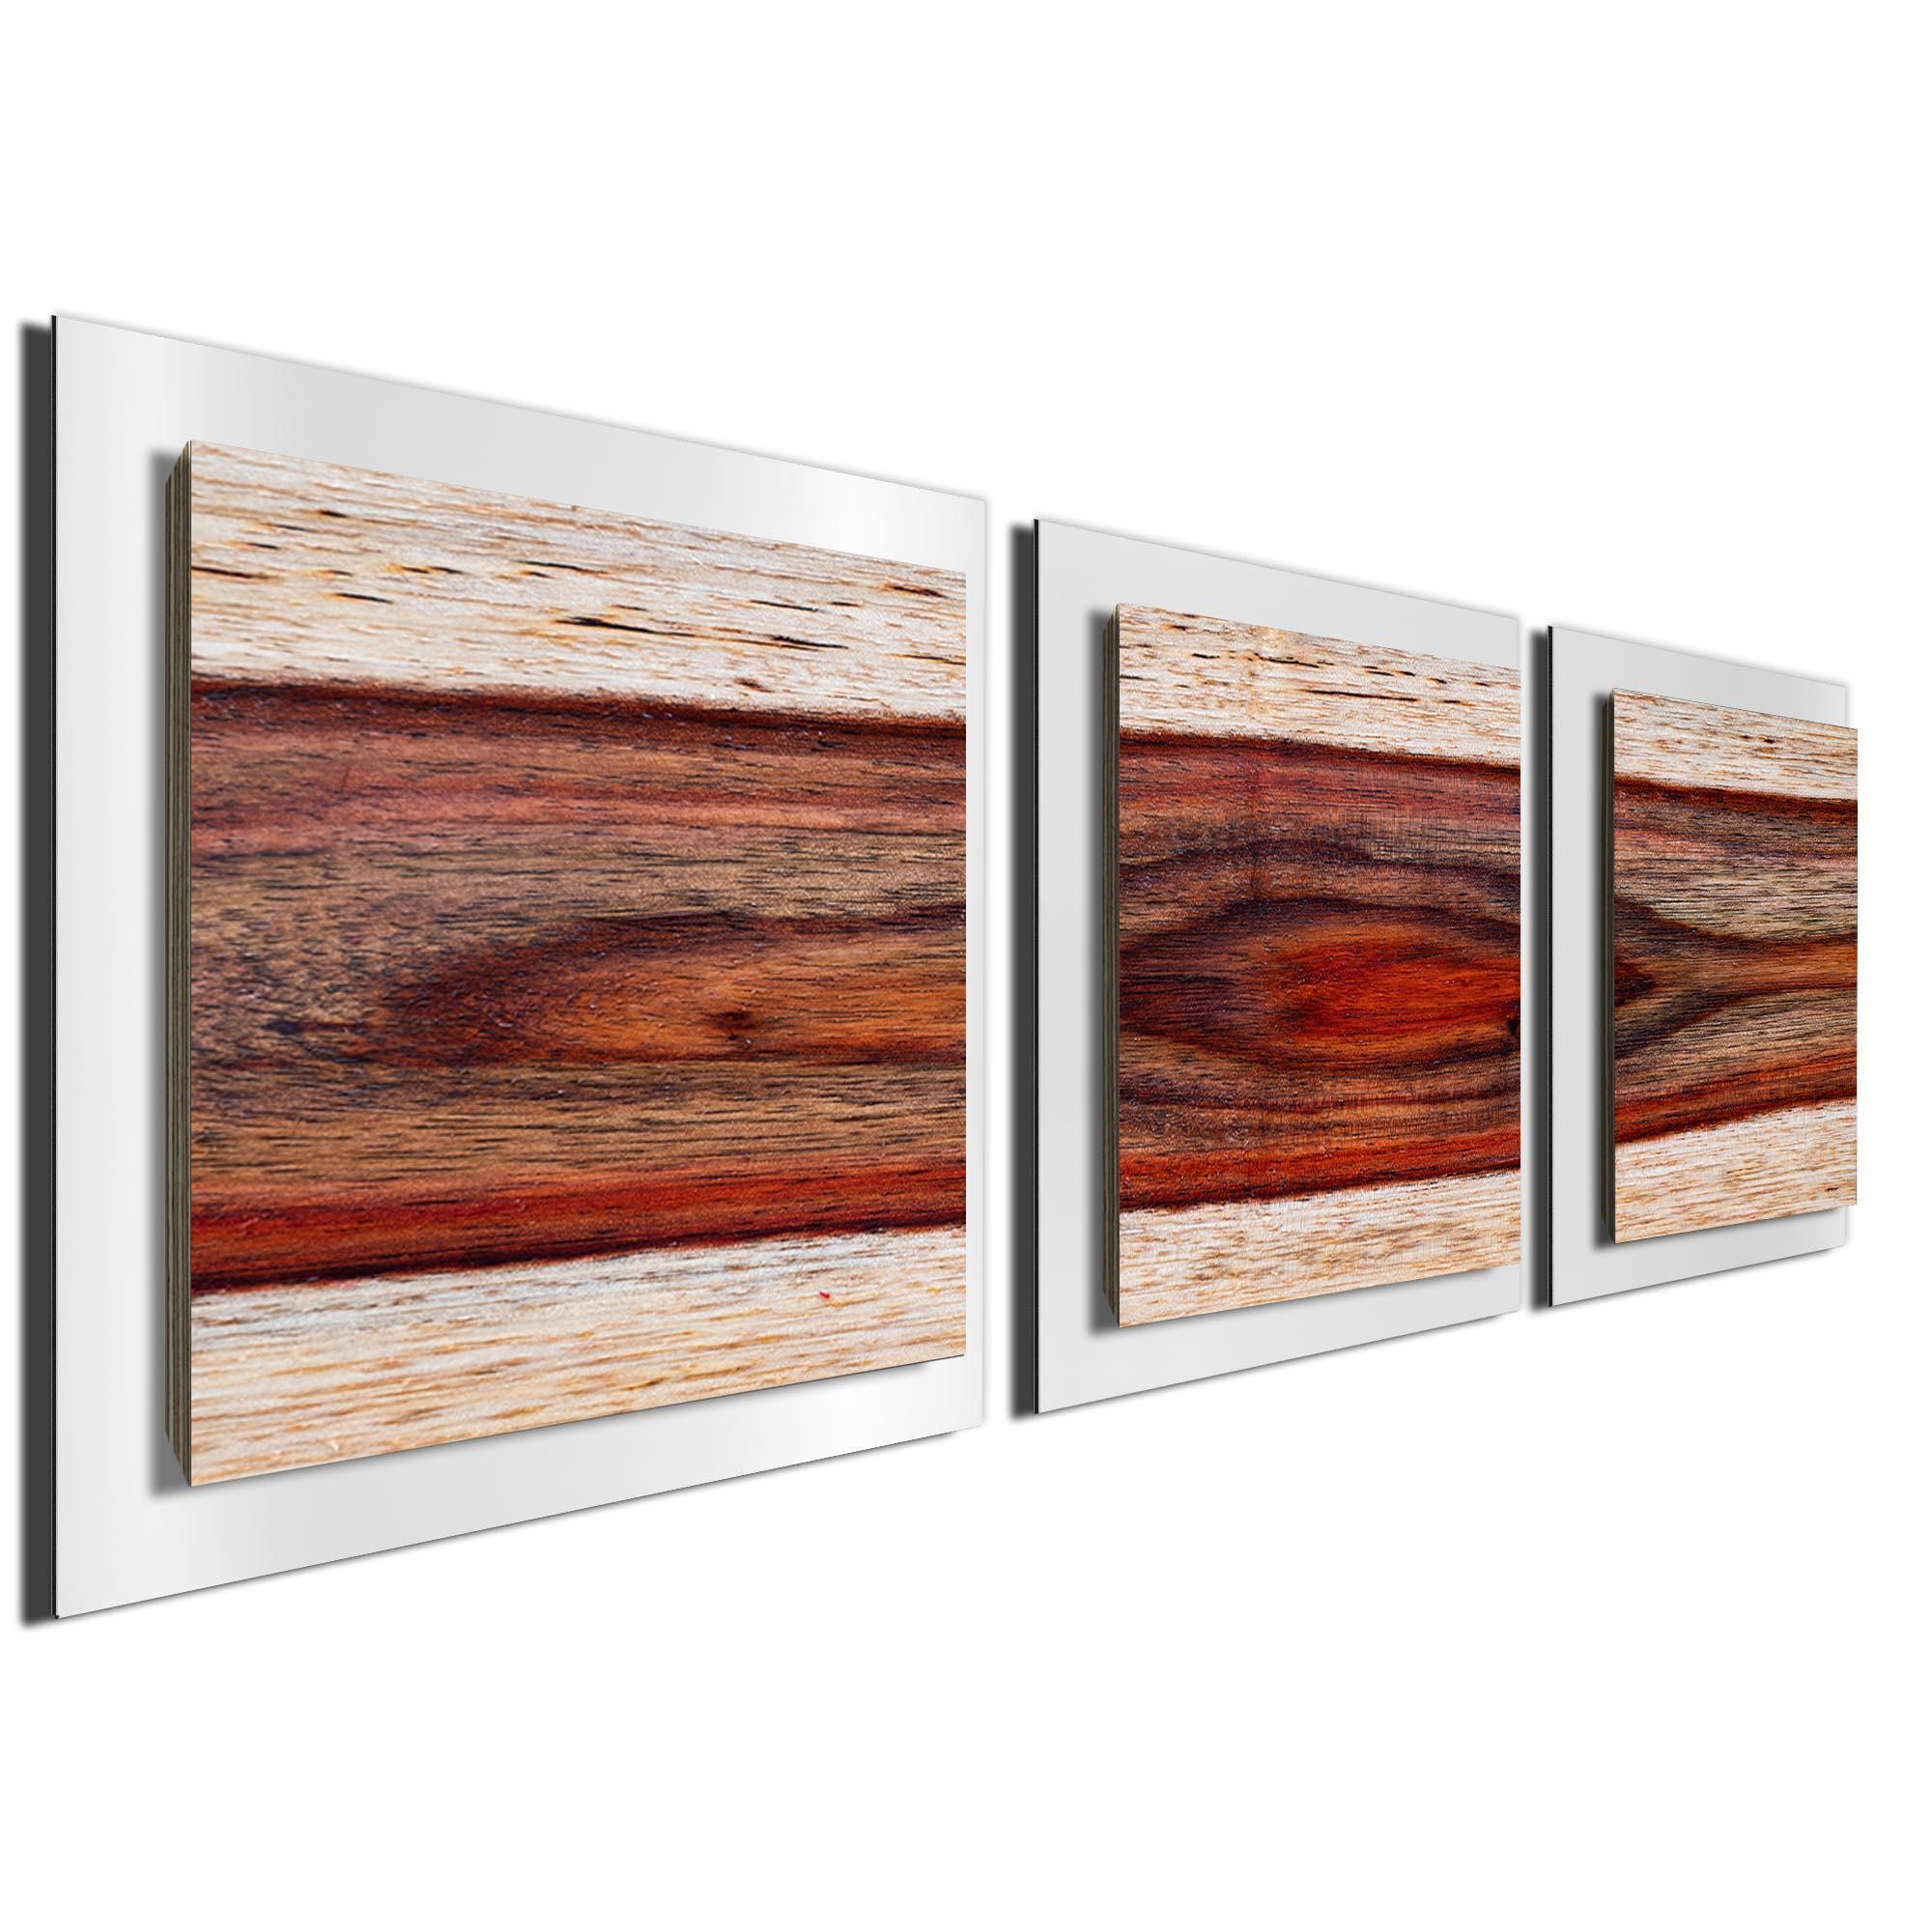 Auburn Wood Essence White by Adam Schwoeppe Rustic Modern Style Wood Wall Art - Image 2